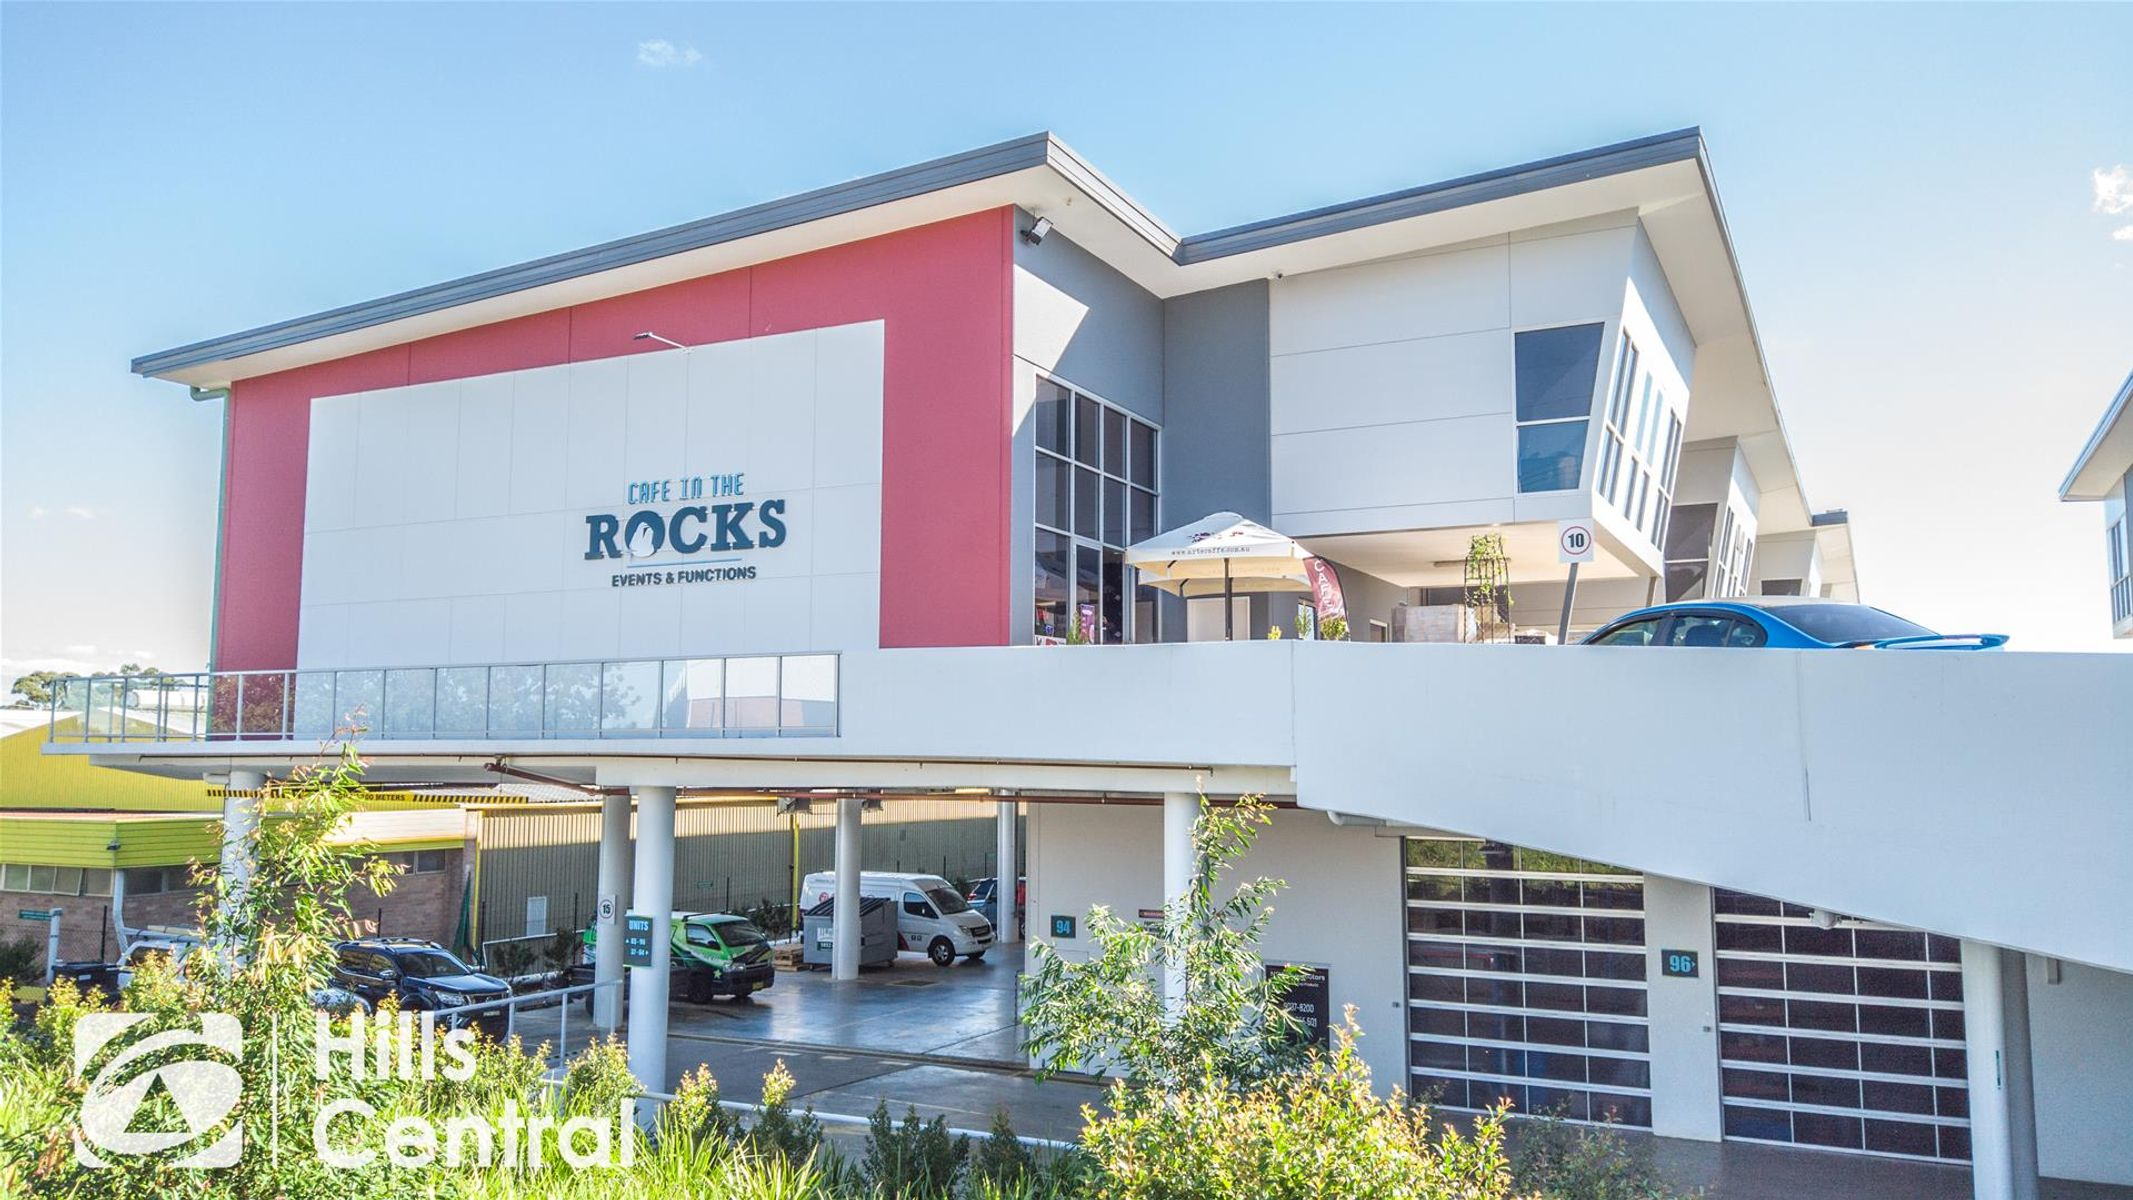 22/14 Loyalty Road, North Rocks, NSW 2151